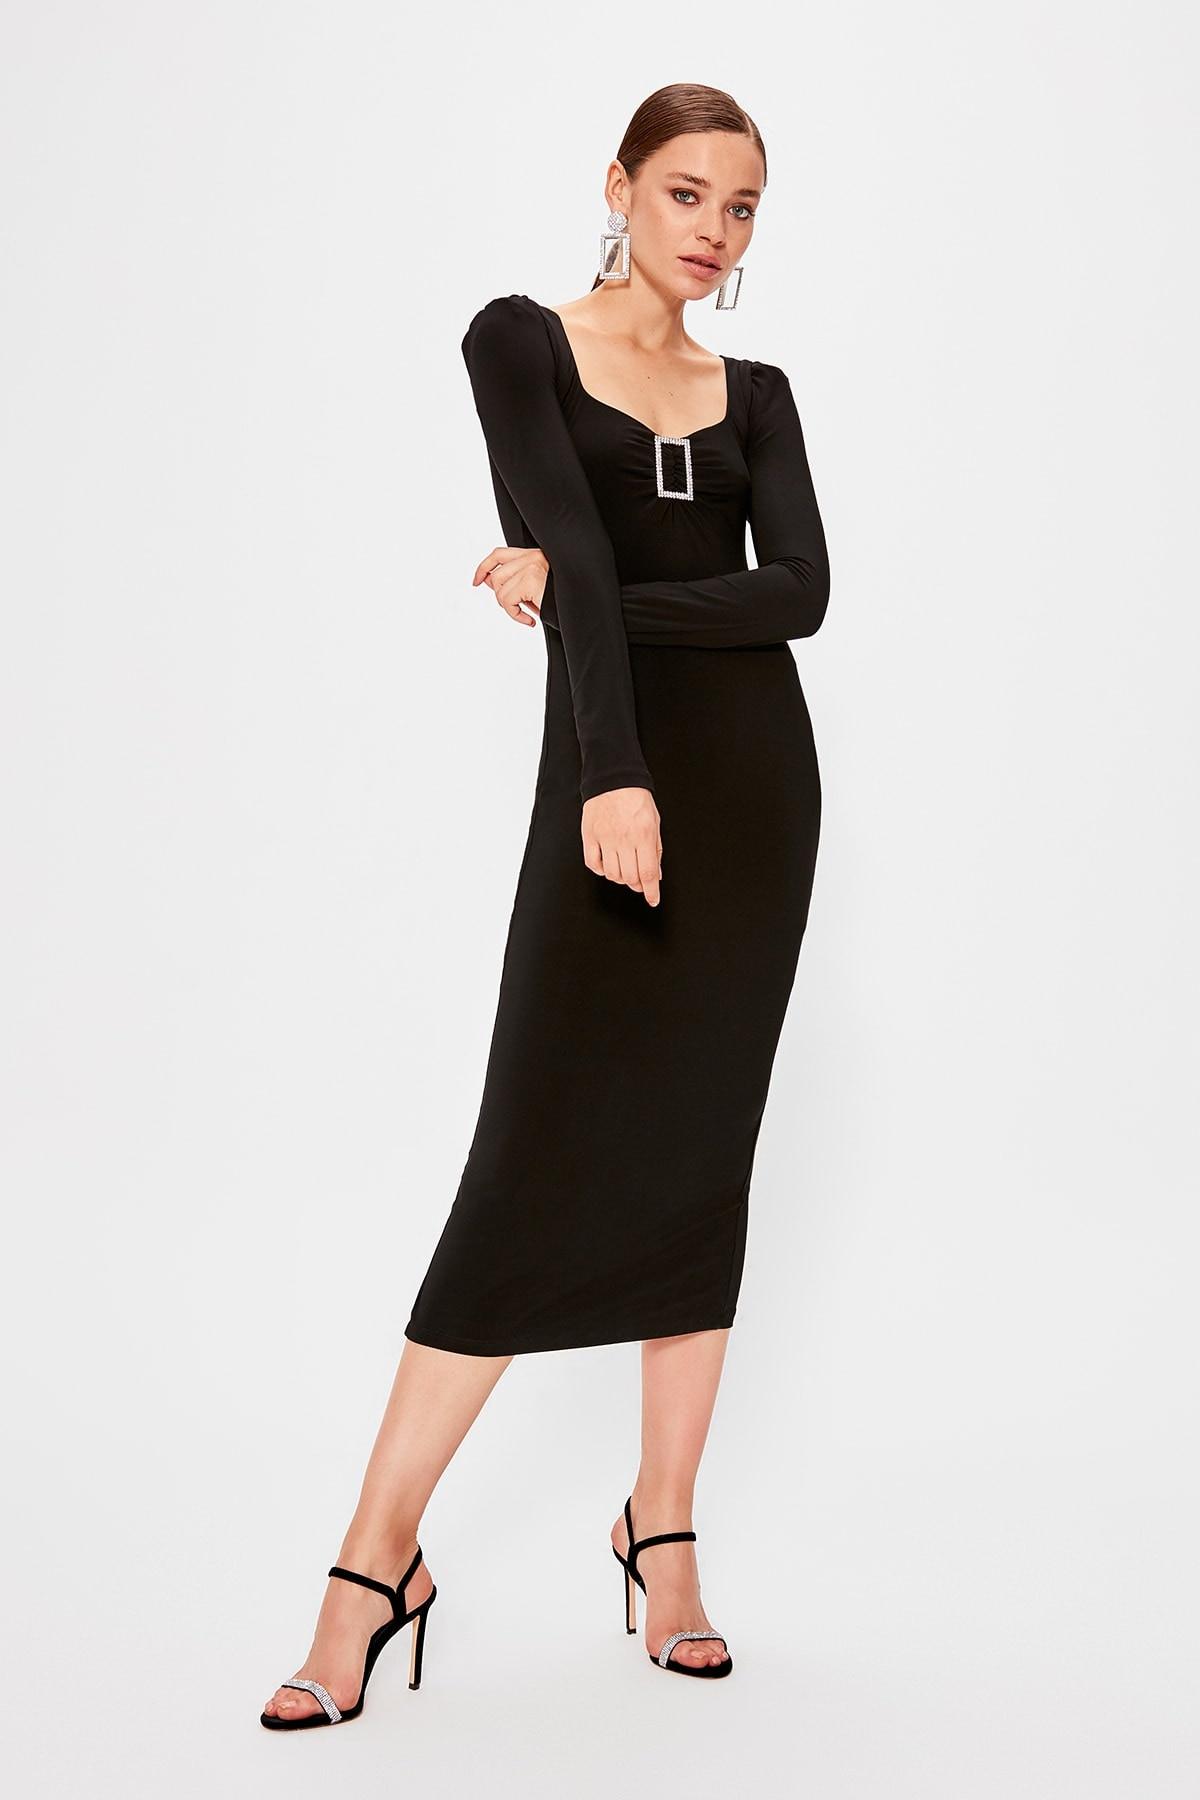 Trendyol Accessory Detailed Dress TPRAW20EL0616